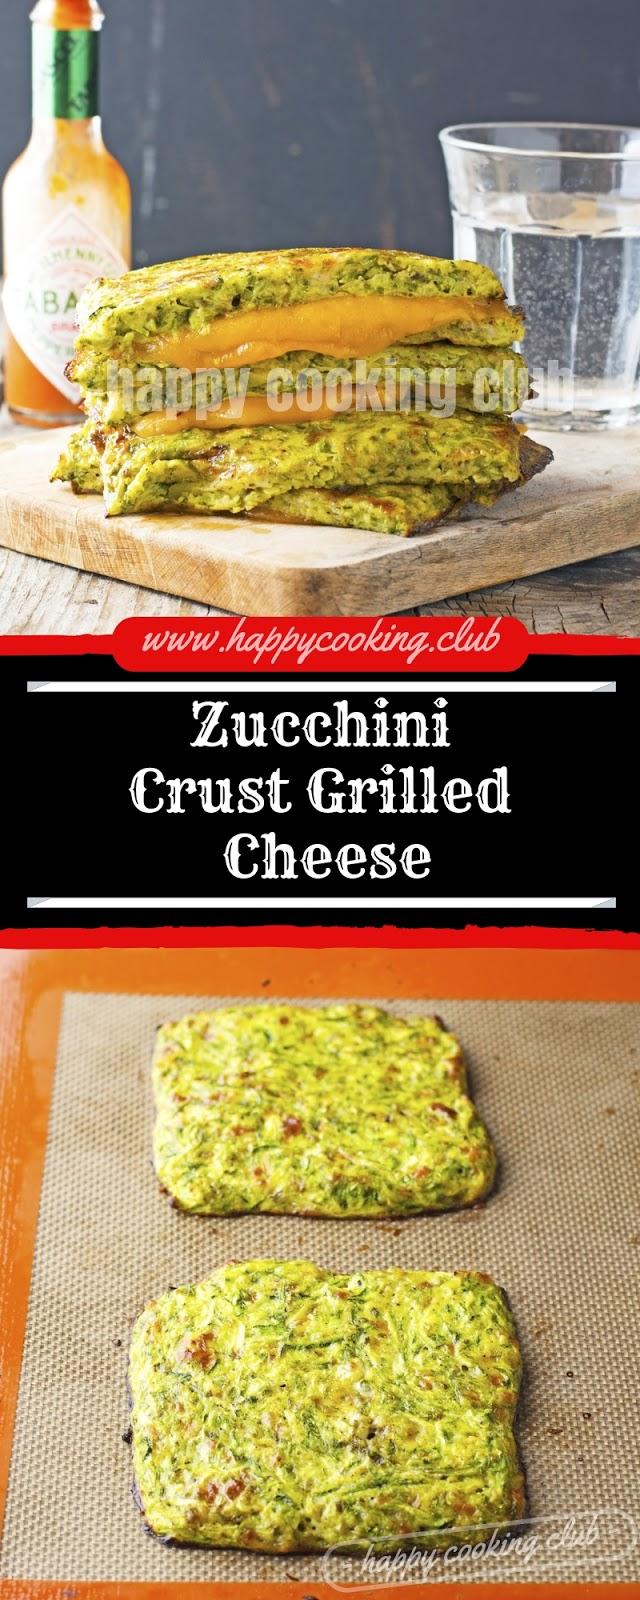 Zucchini Crust Grilled Cheese